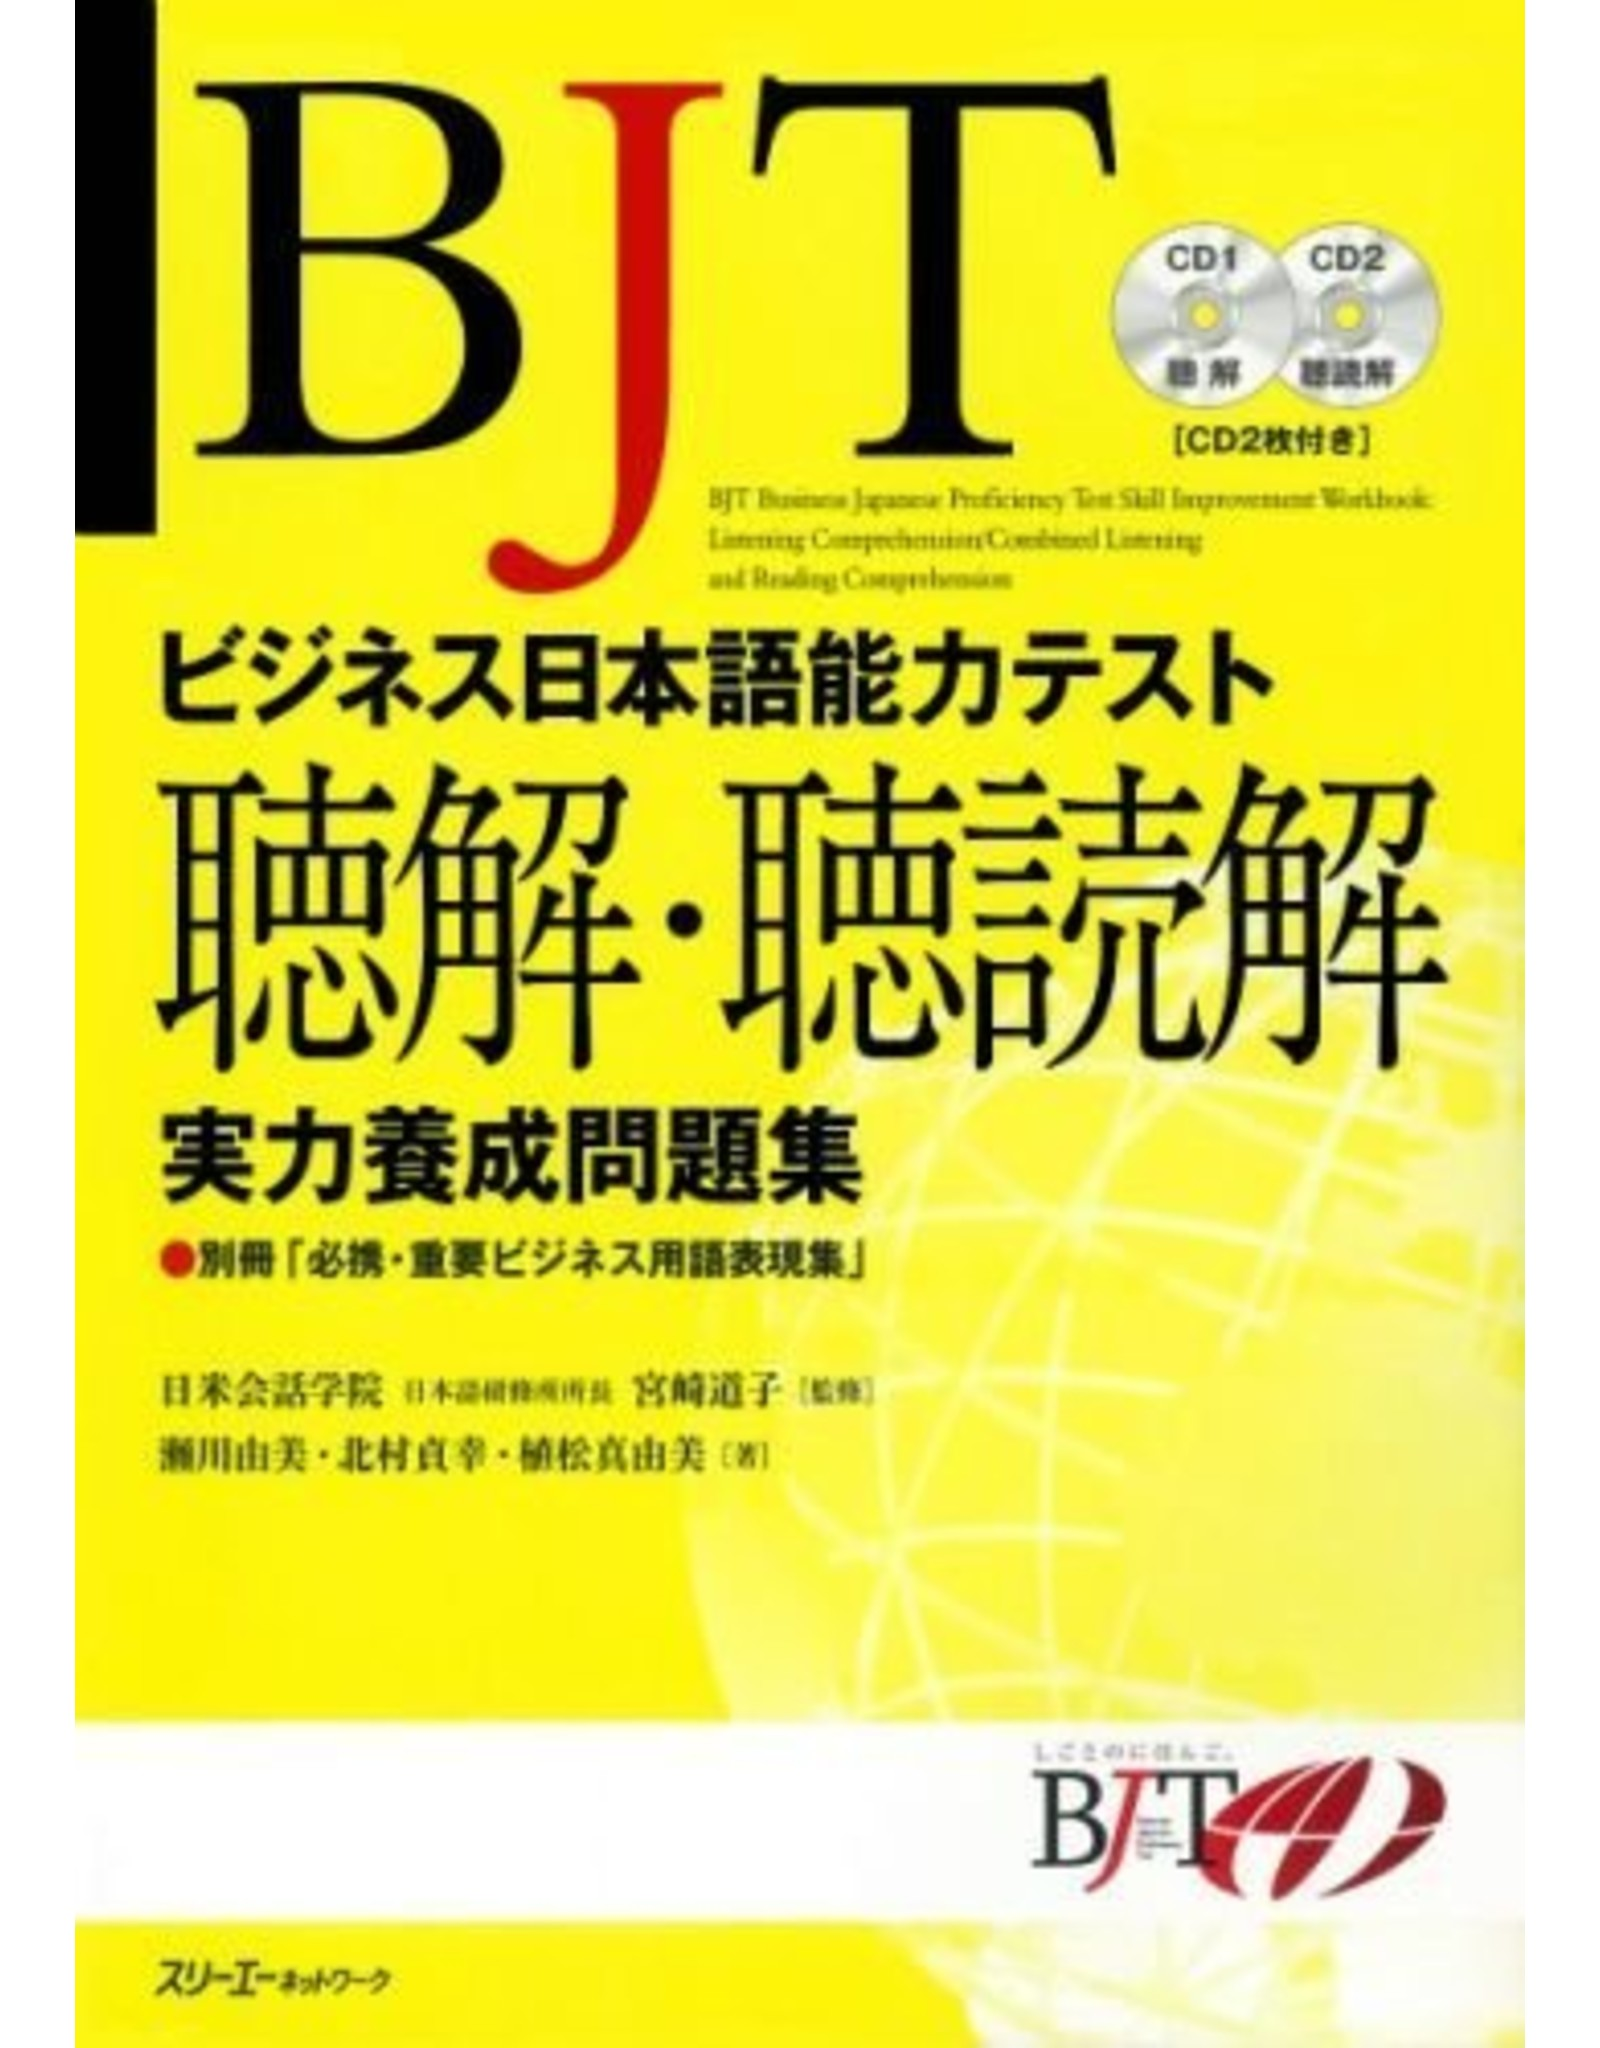 3A Corporation BJT WORKBOOK : LISTENING COMPREHENSION/COMBINED LISTENING & READING COMPREHENSION W/CDS